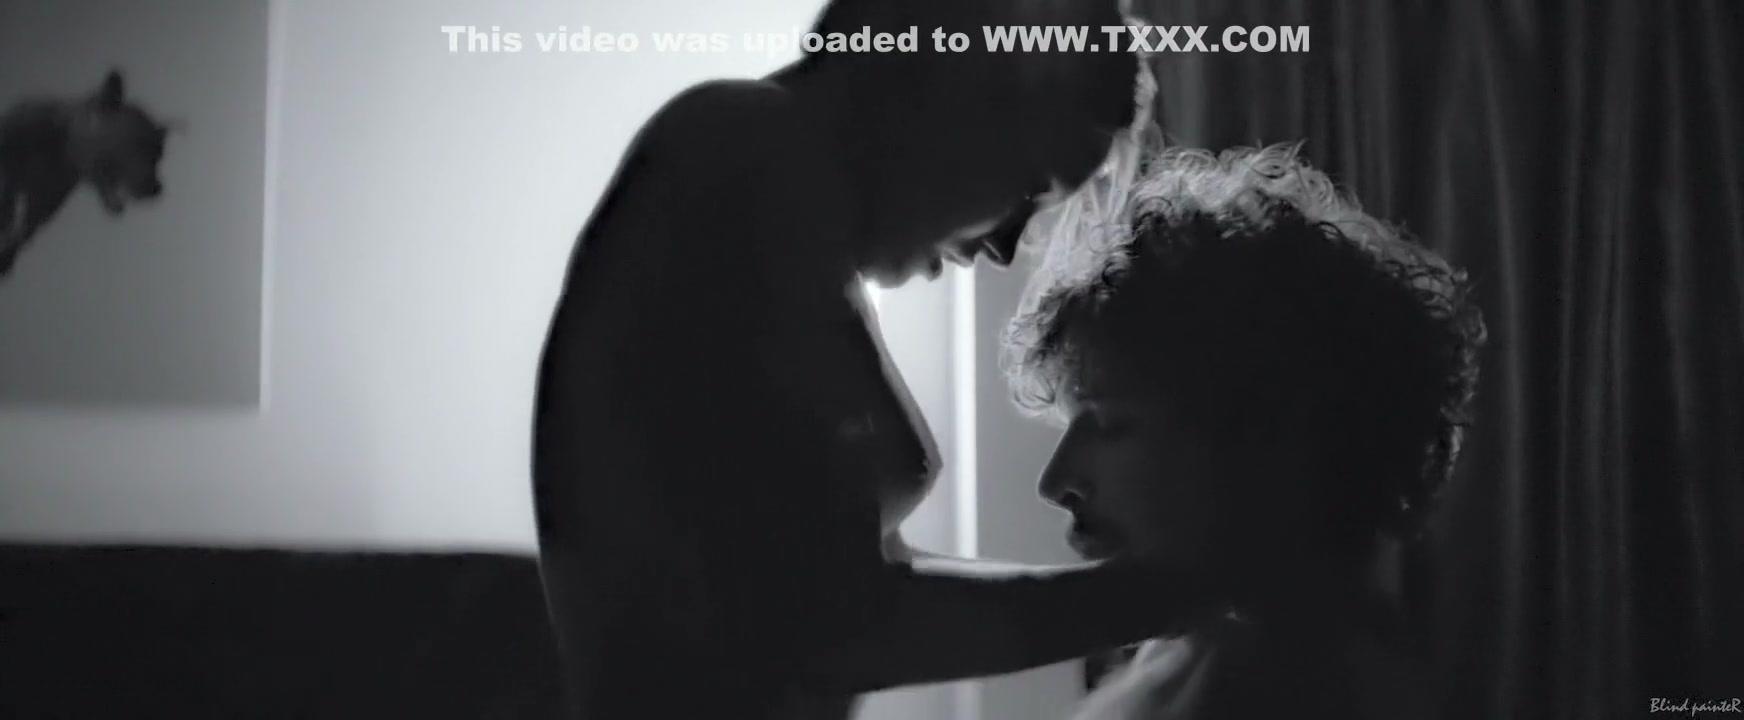 Naked FuckBook Watch sex videos free